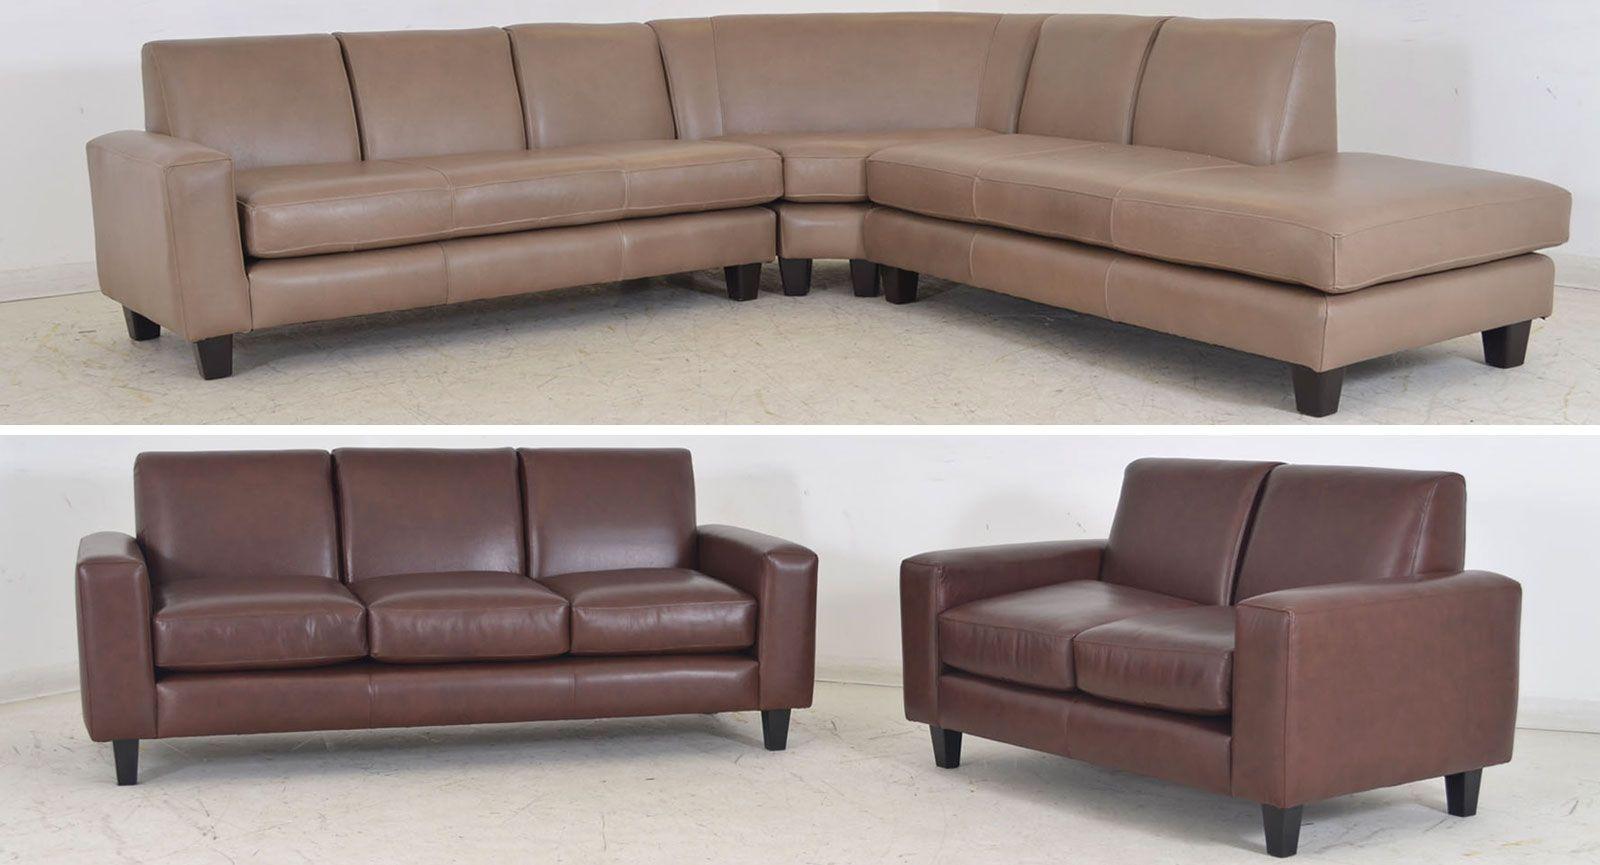 Outstanding Elegante Sofa Loveseat Sectional The Leather Sofa Spiritservingveterans Wood Chair Design Ideas Spiritservingveteransorg